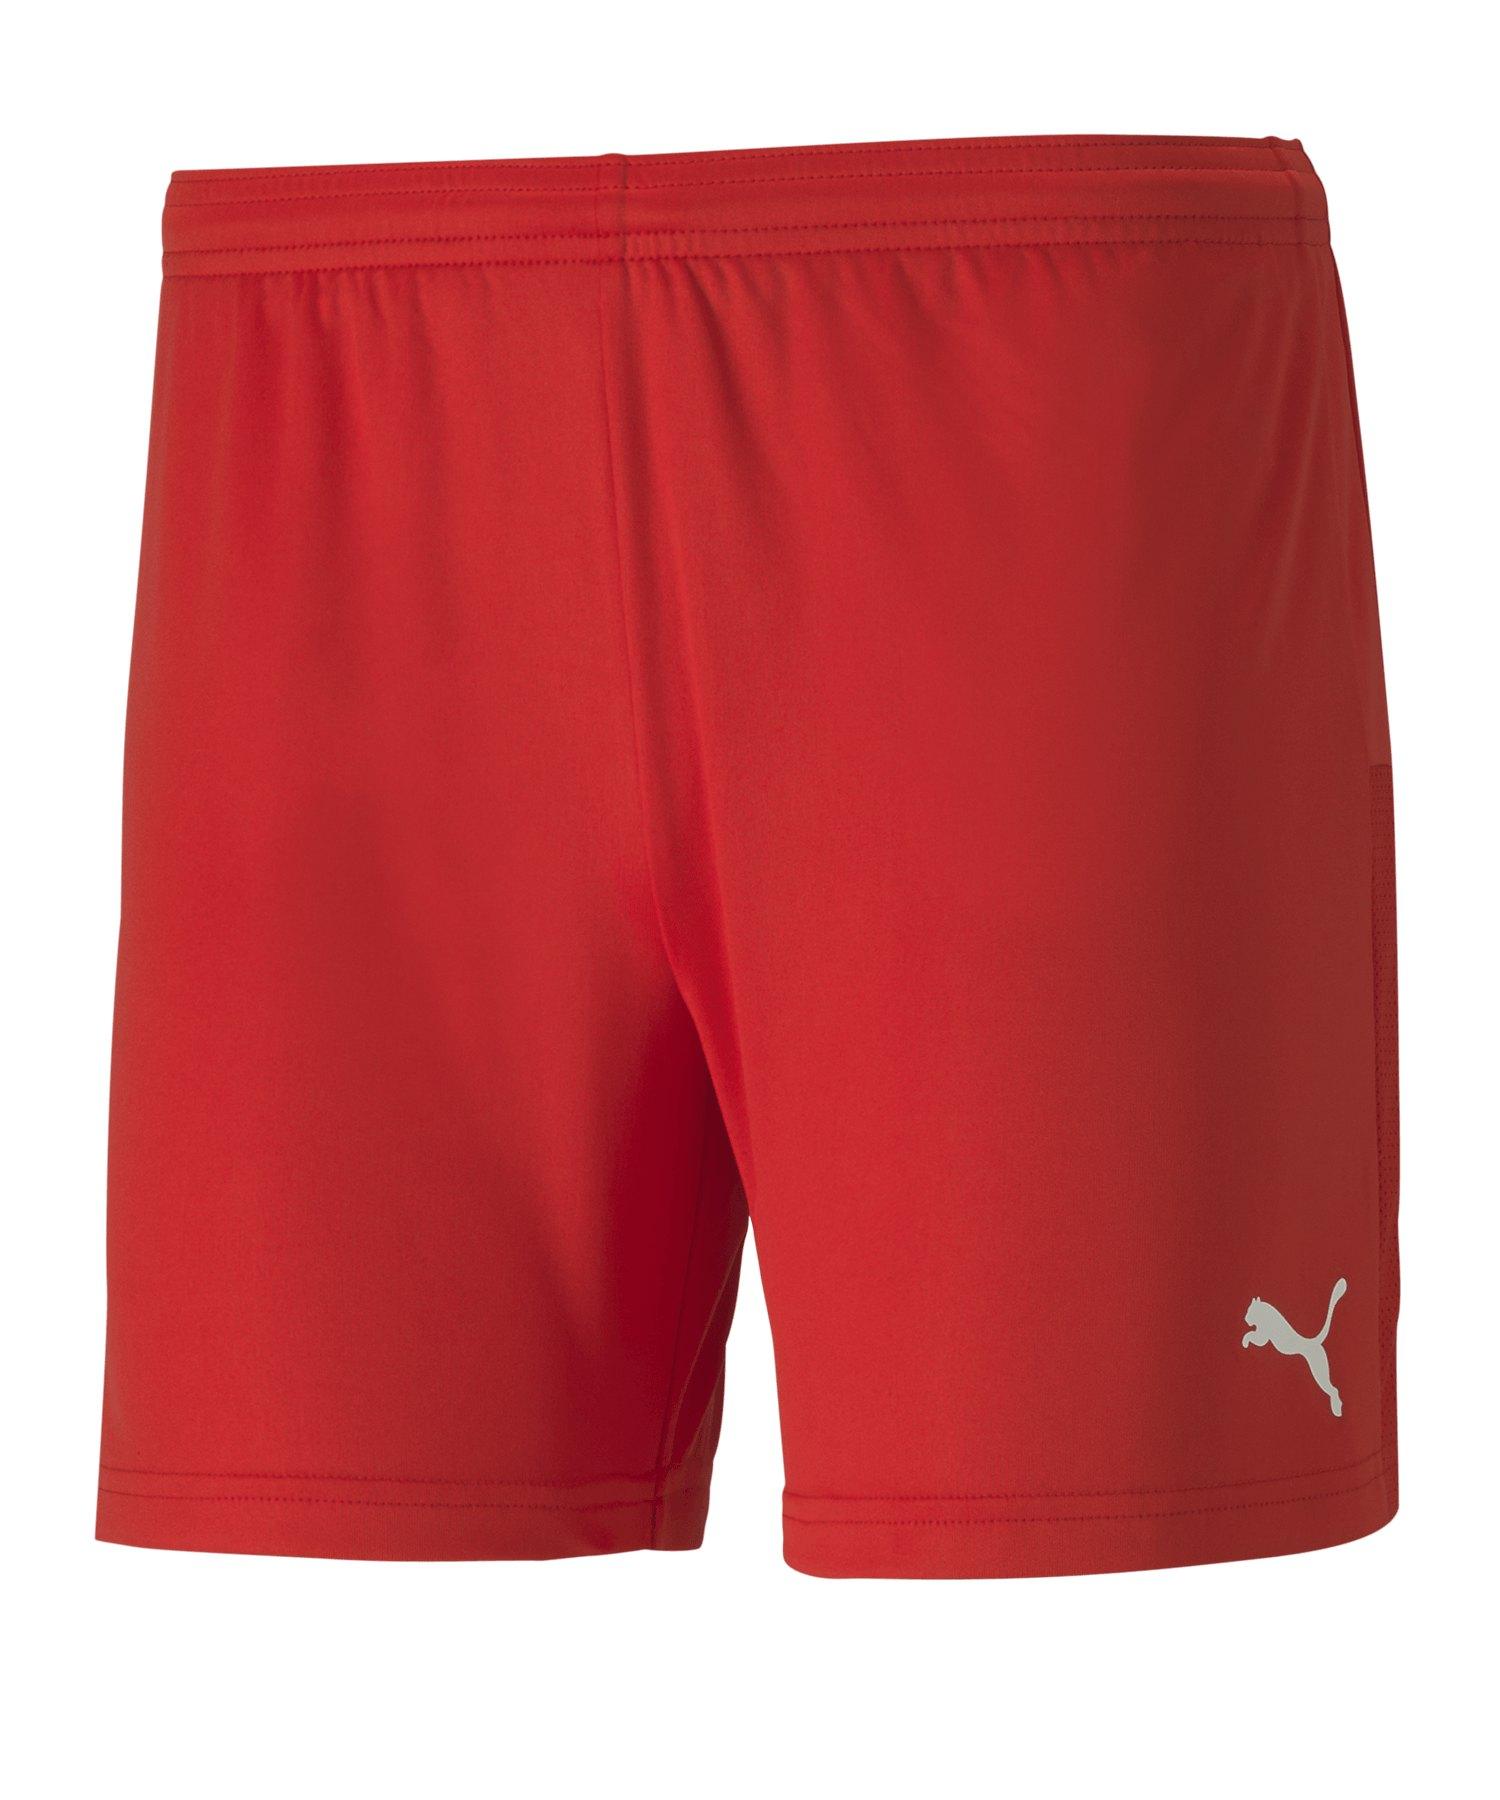 PUMA teamGOAL 23 Knit Shorts Damen Rot F01 - rot